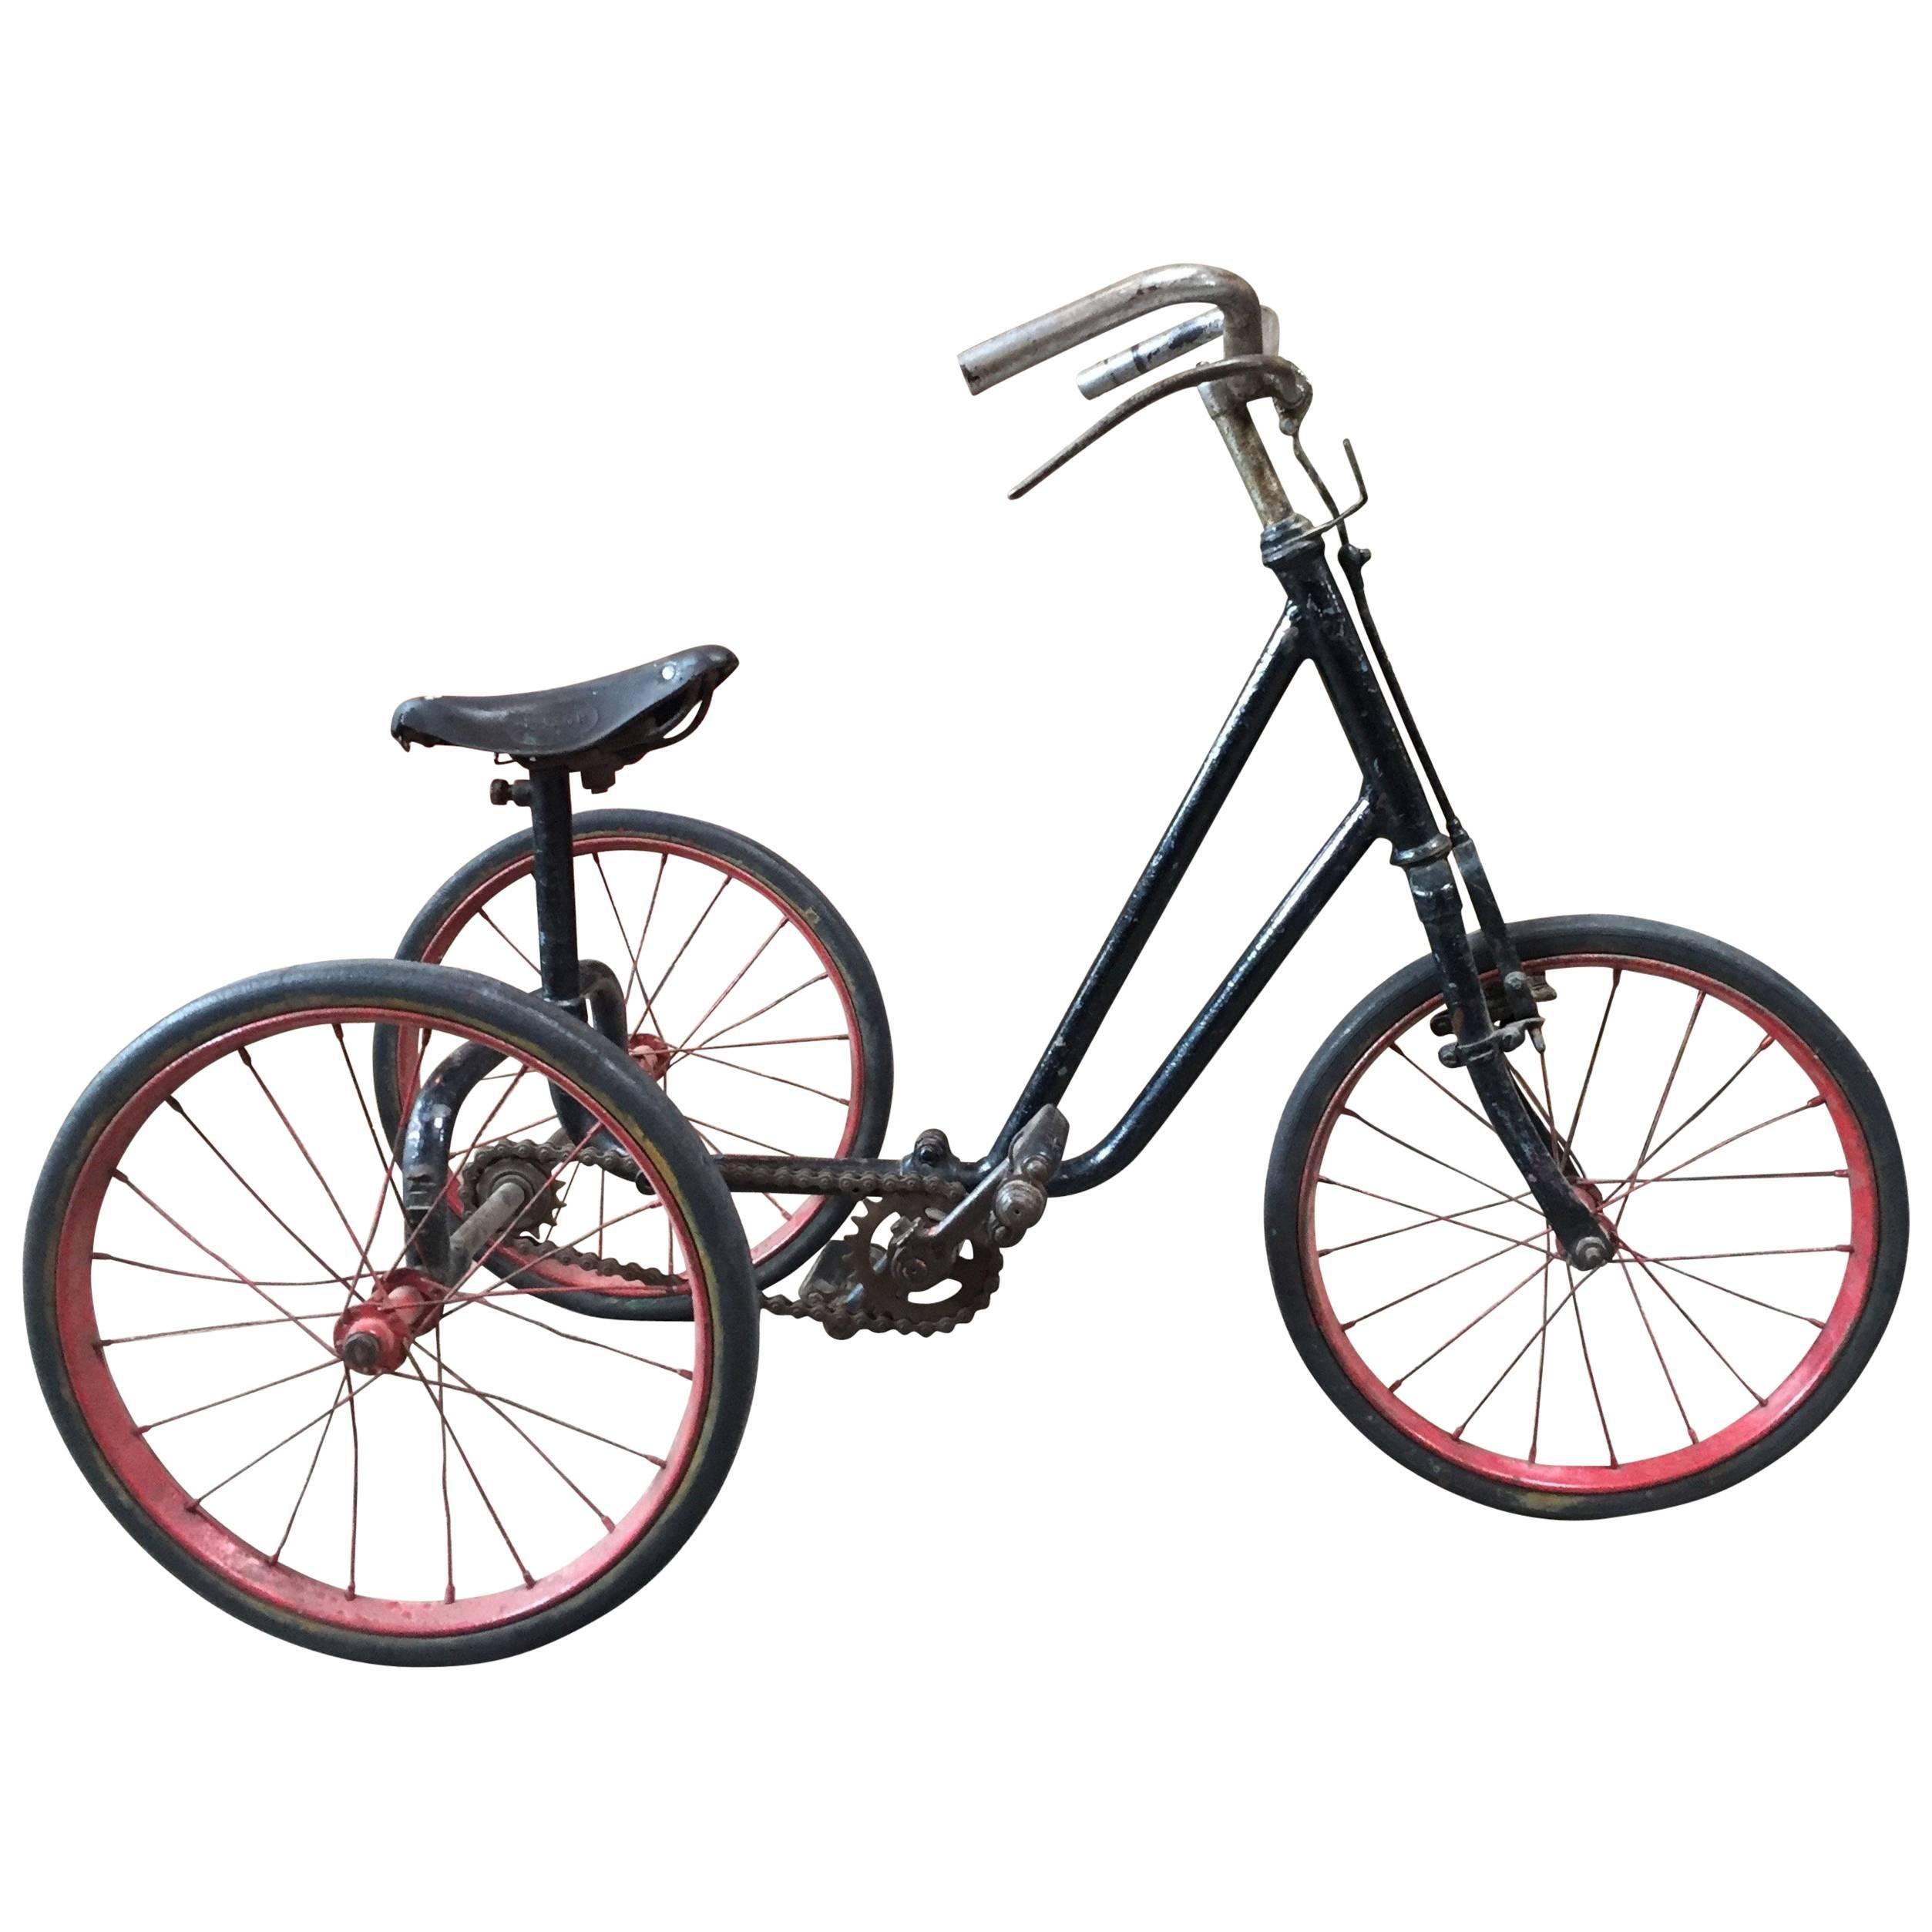 1920s British Dunlop Tricycle Bike